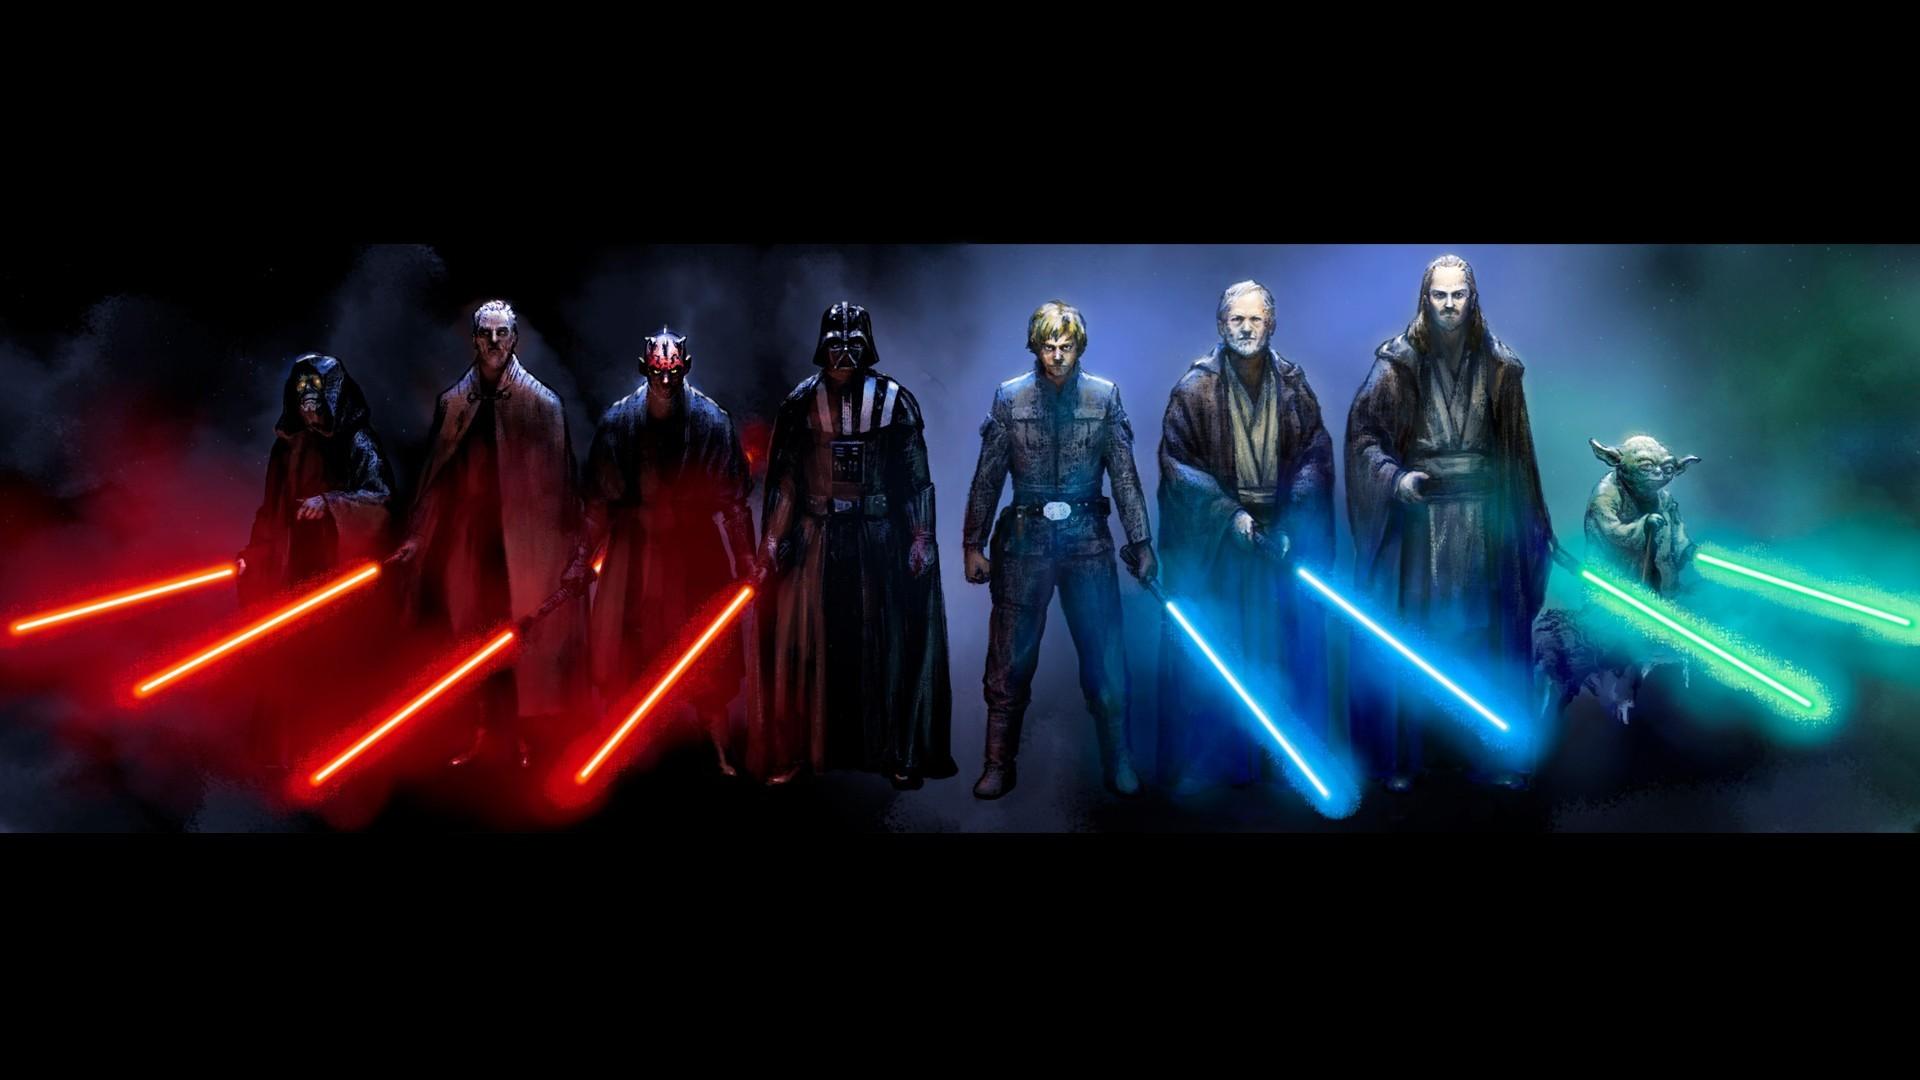 Star Wars Female Jedi   Hd Desktop Wallpaper – star wars darth vader sith  jedi luke